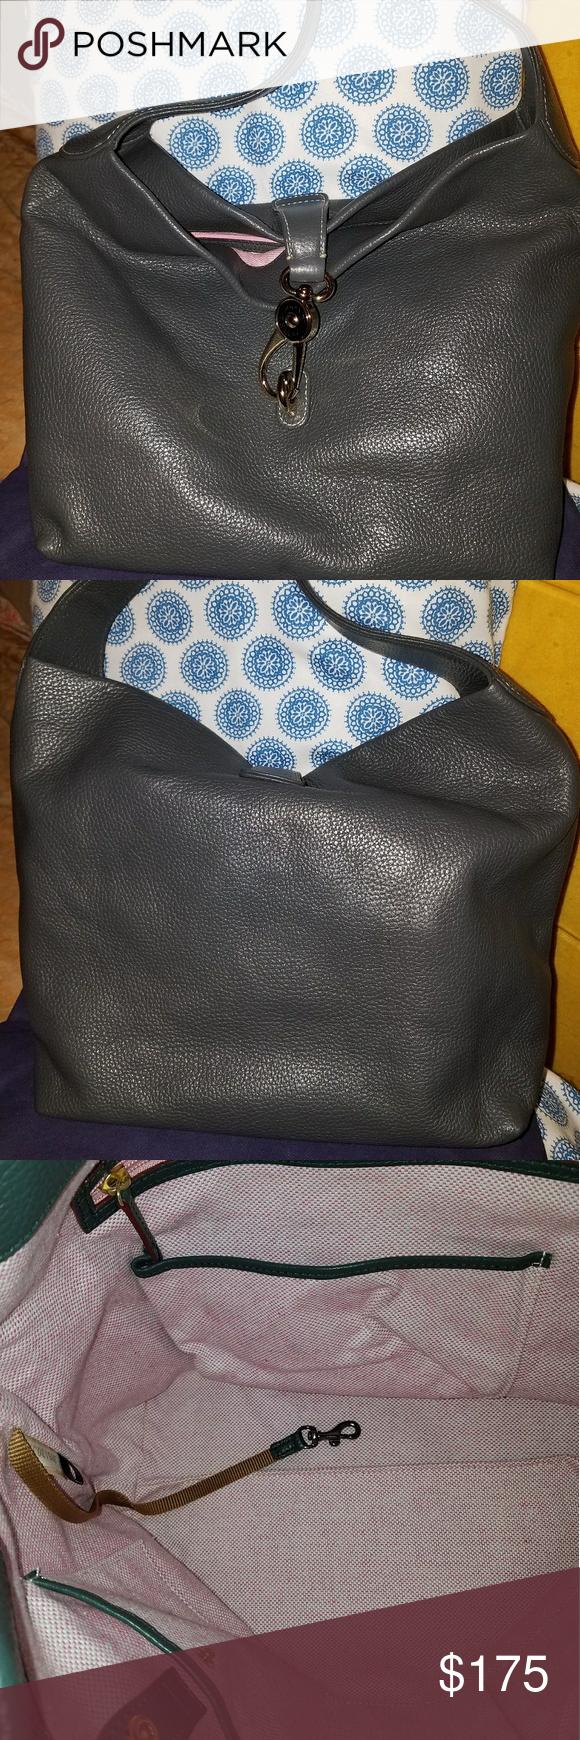 Dooney And Bourke Logo Lock Hobo Charcoal Gray Charcoal Gray Excellent Like New Condition Pebble Leather Logo Lock Hobo.Smoke Free Home Dooney & Bourke Bags Hobos